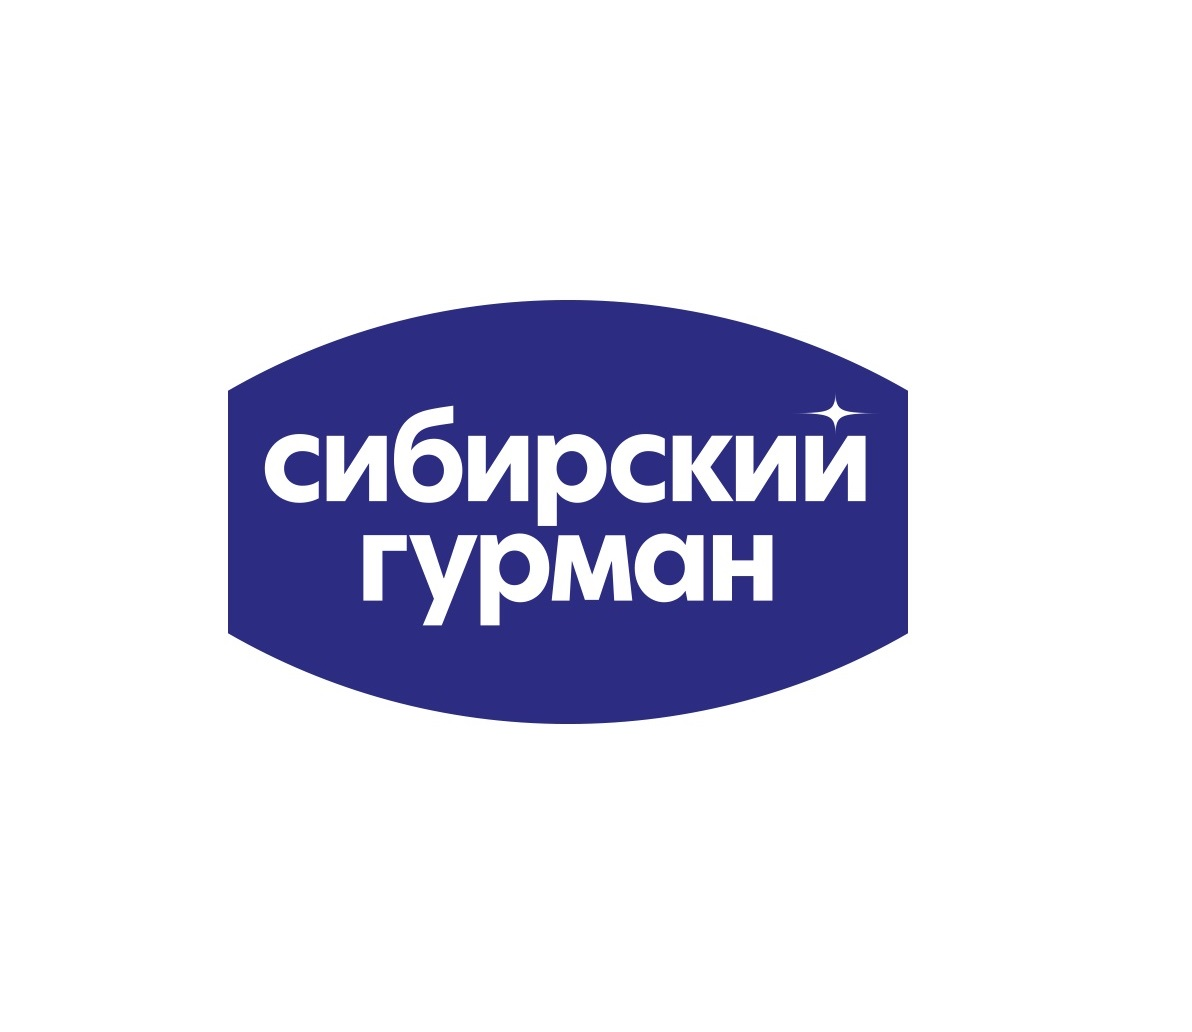 Сибирский Гурман, ООО